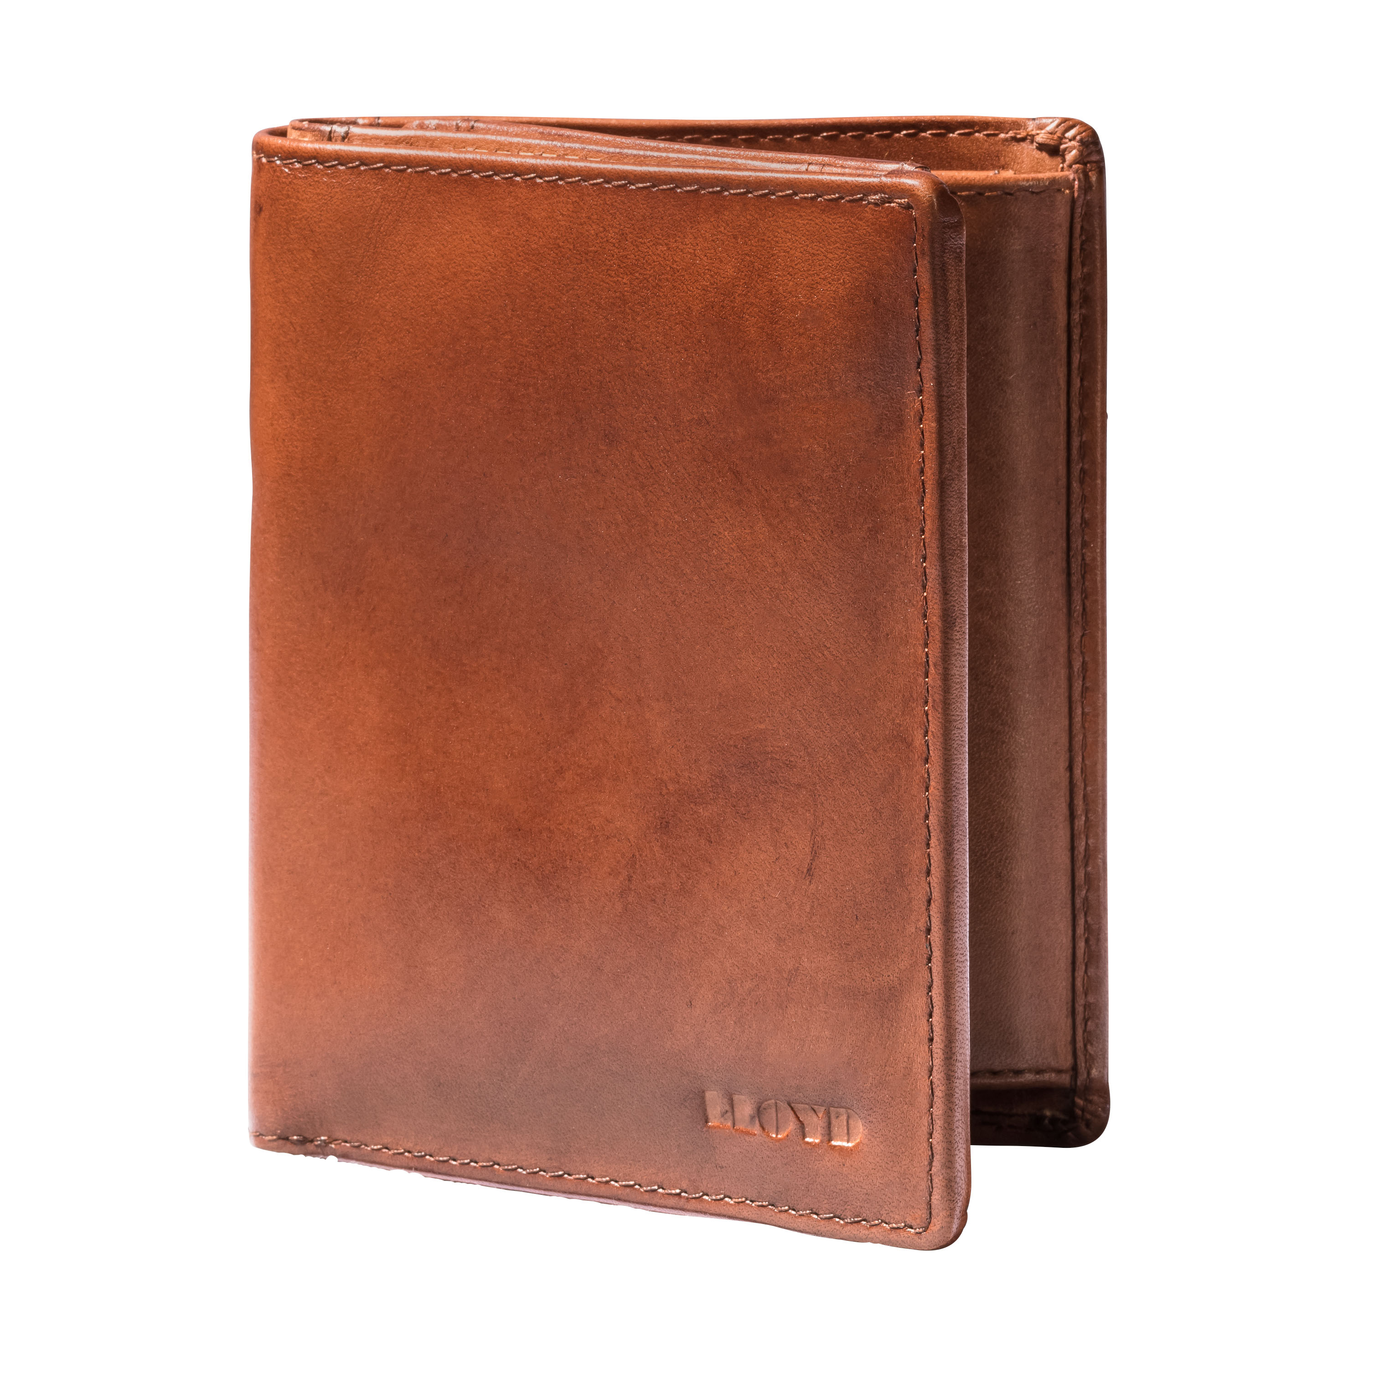 Geldbörse | Accessoires > Portemonnaies | Braun | Glattleder -  polyester ) | LLOYD